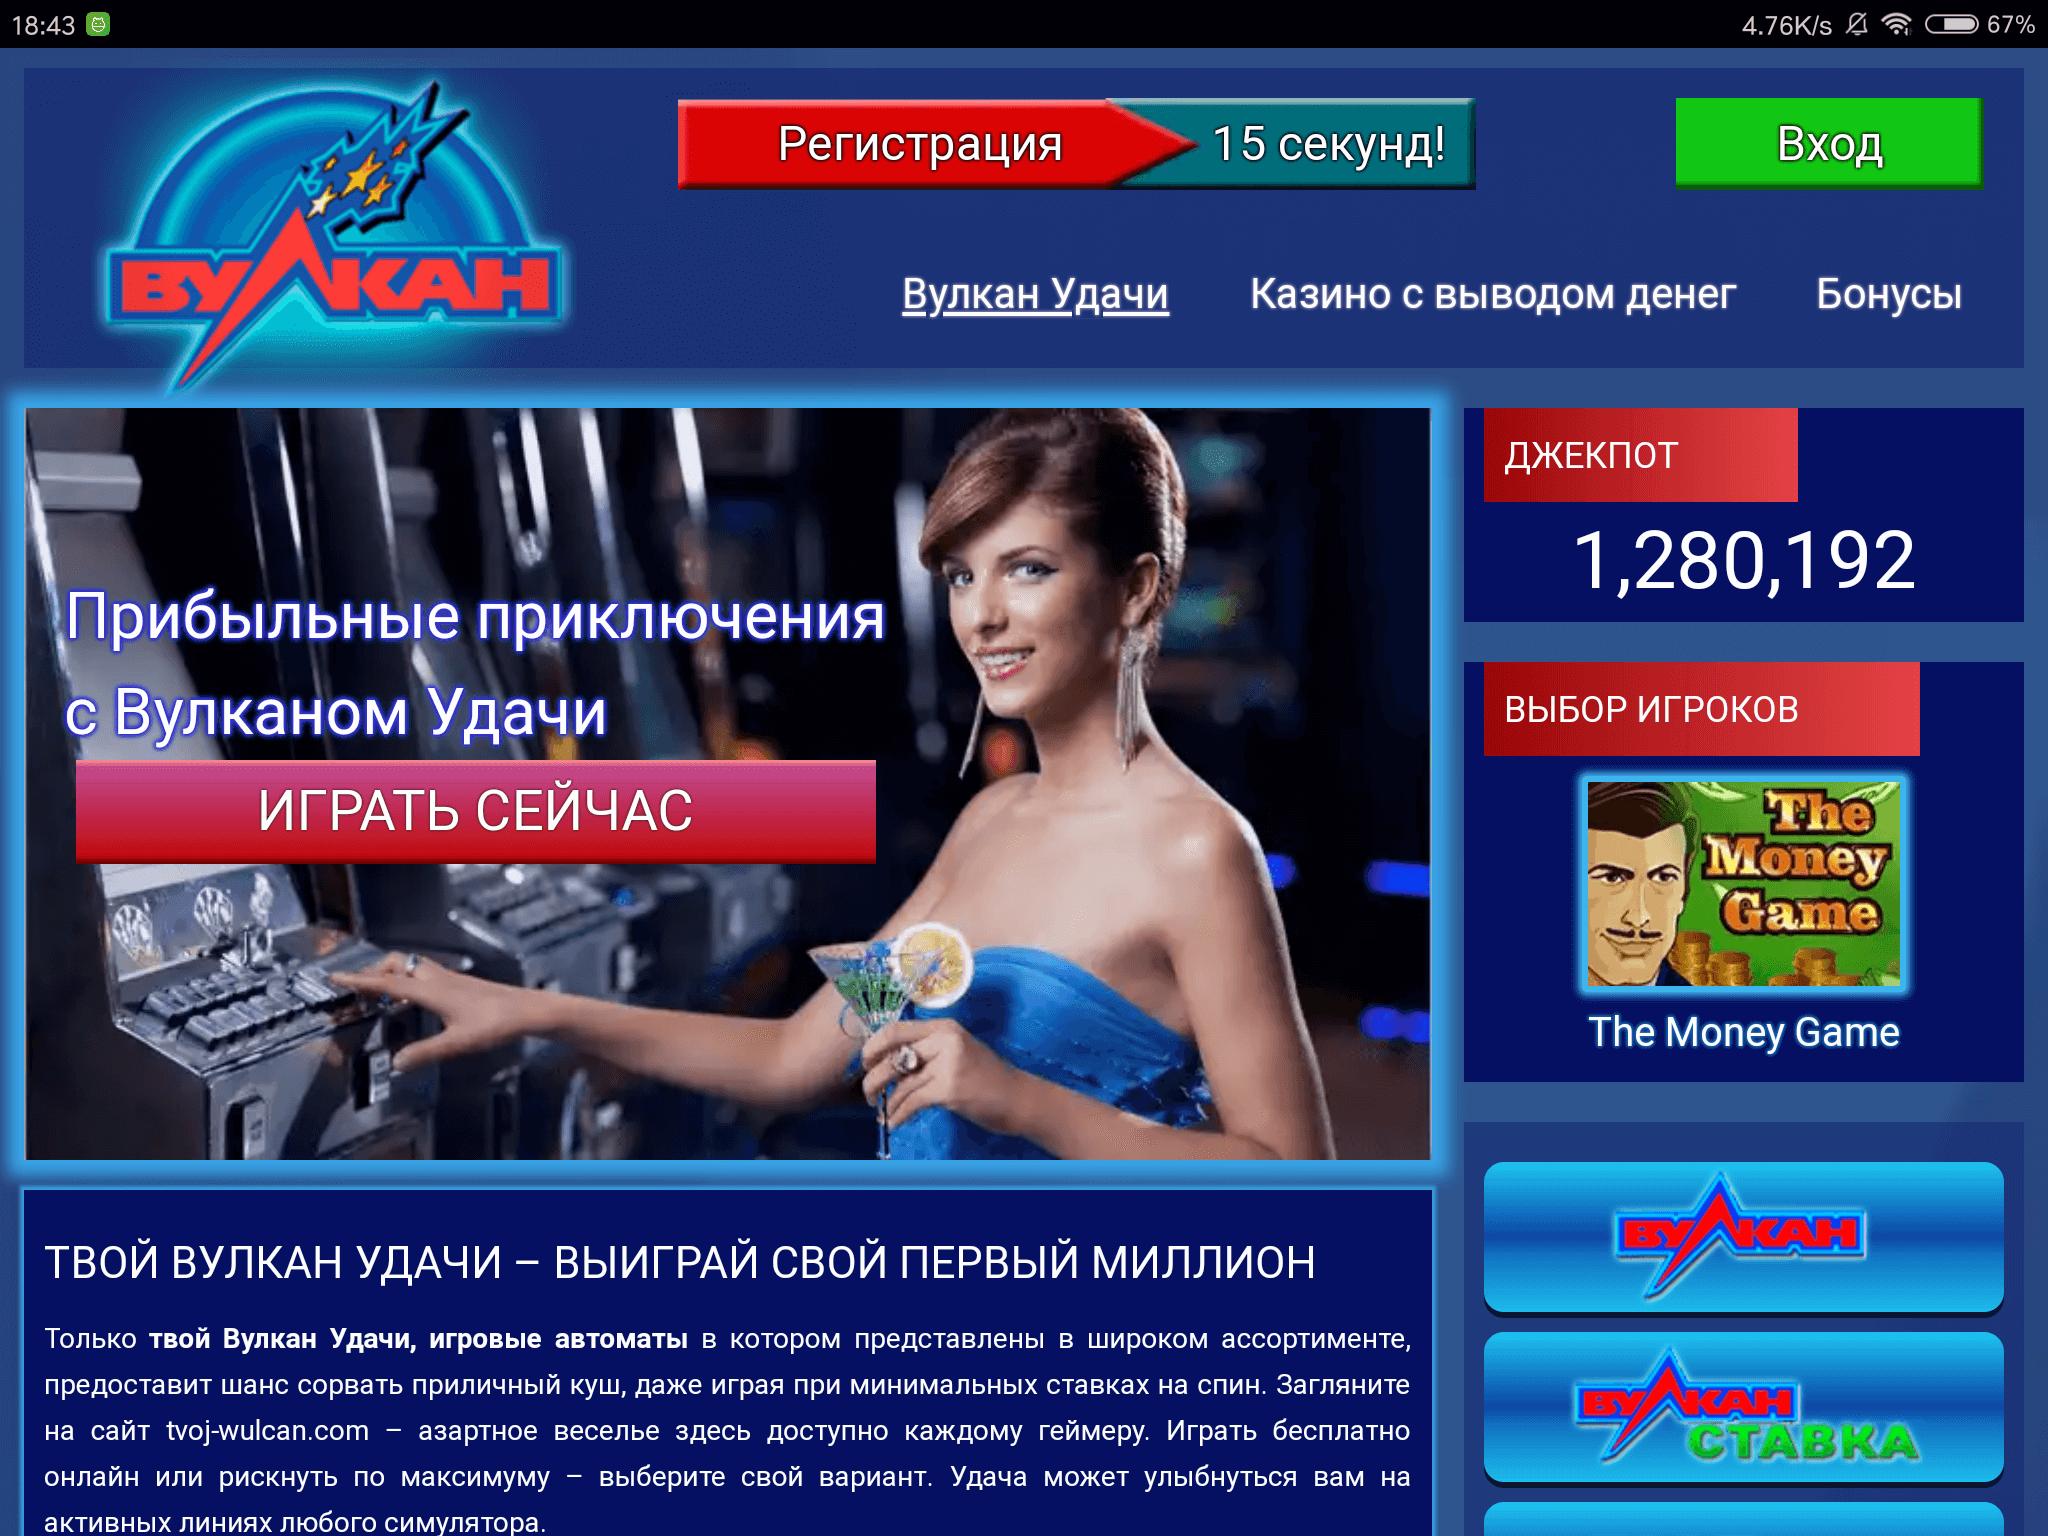 tvoj-wulcan.com_